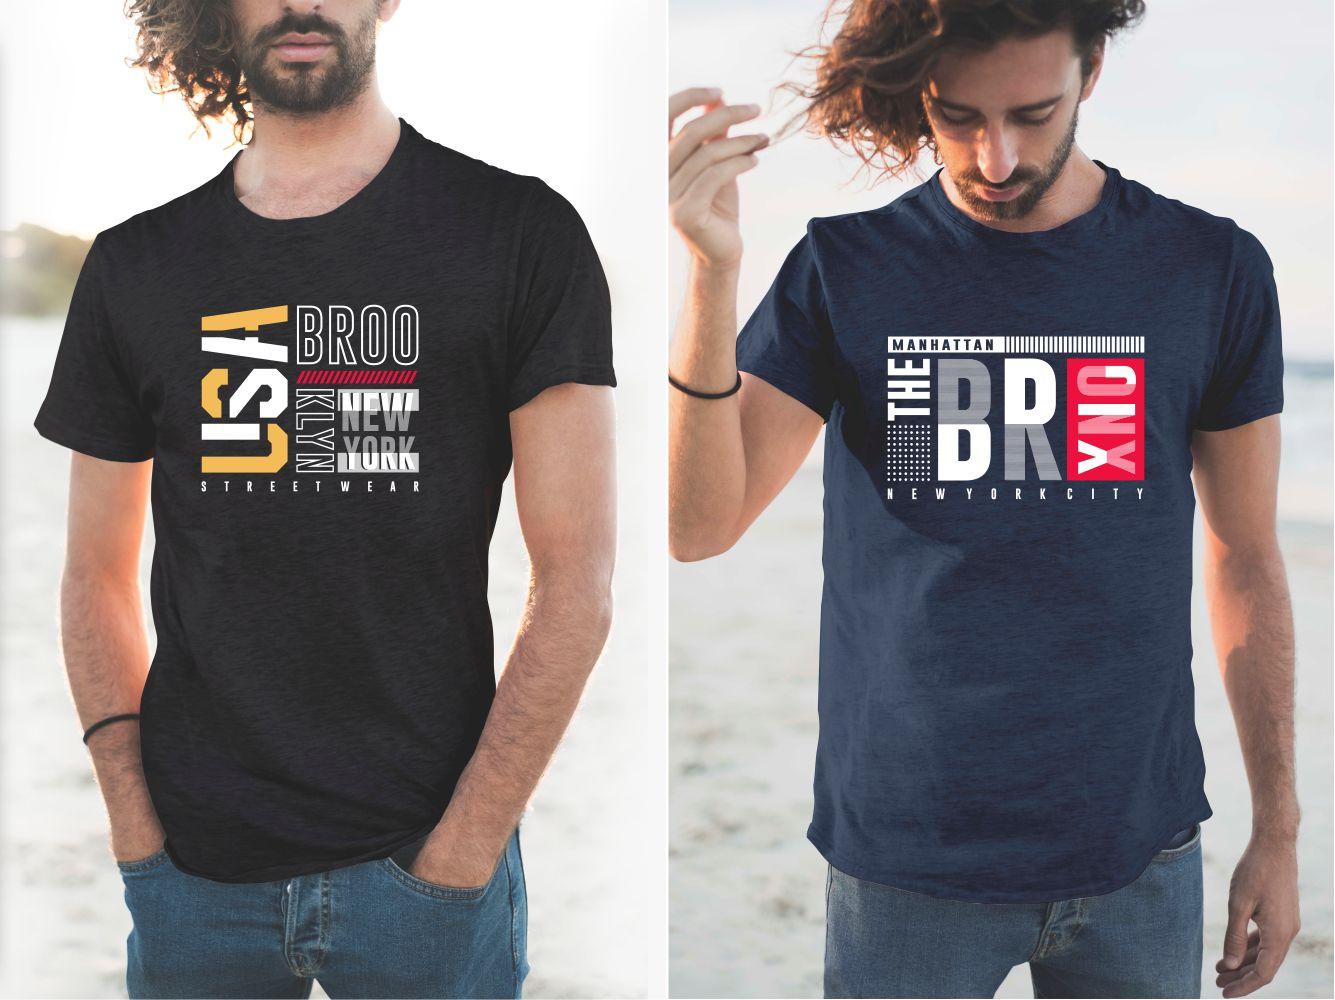 106 Urban T-shirt Designs Collection - 12 7